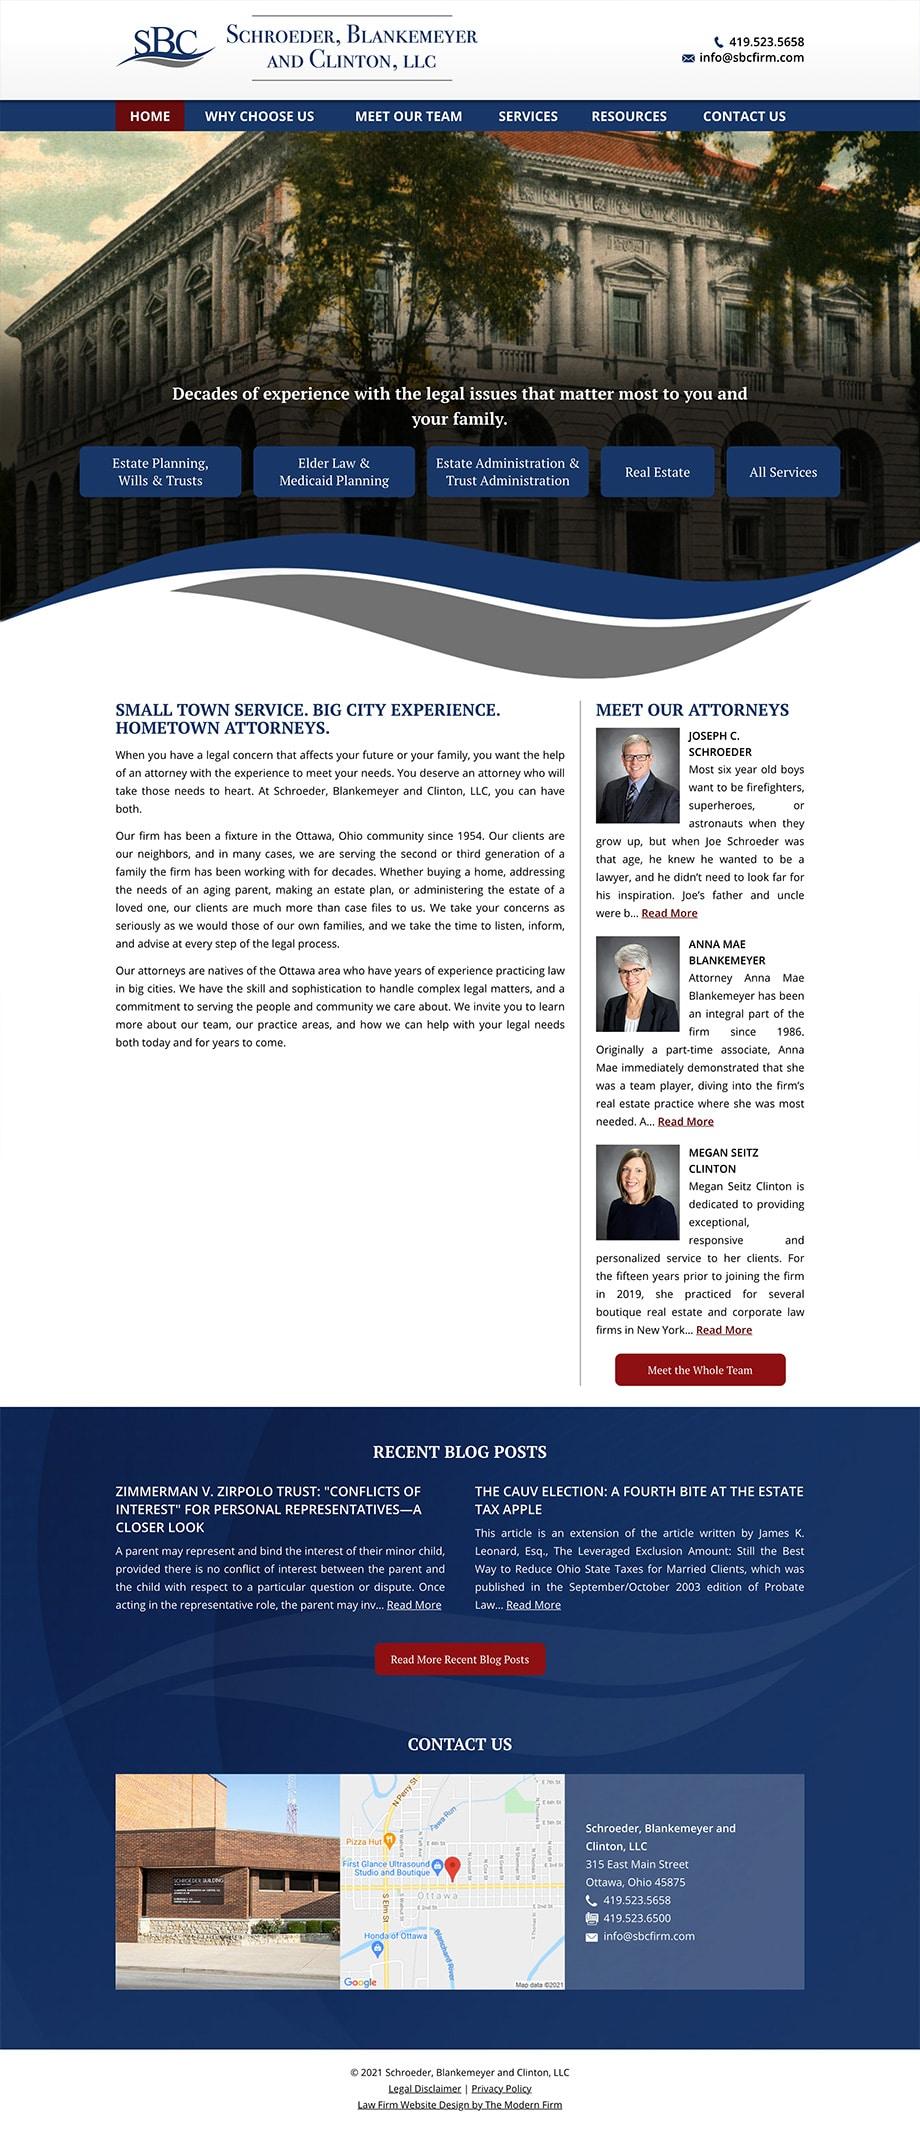 Law Firm Website Design for Schroeder, Blankemeyer and Clinton, LLC